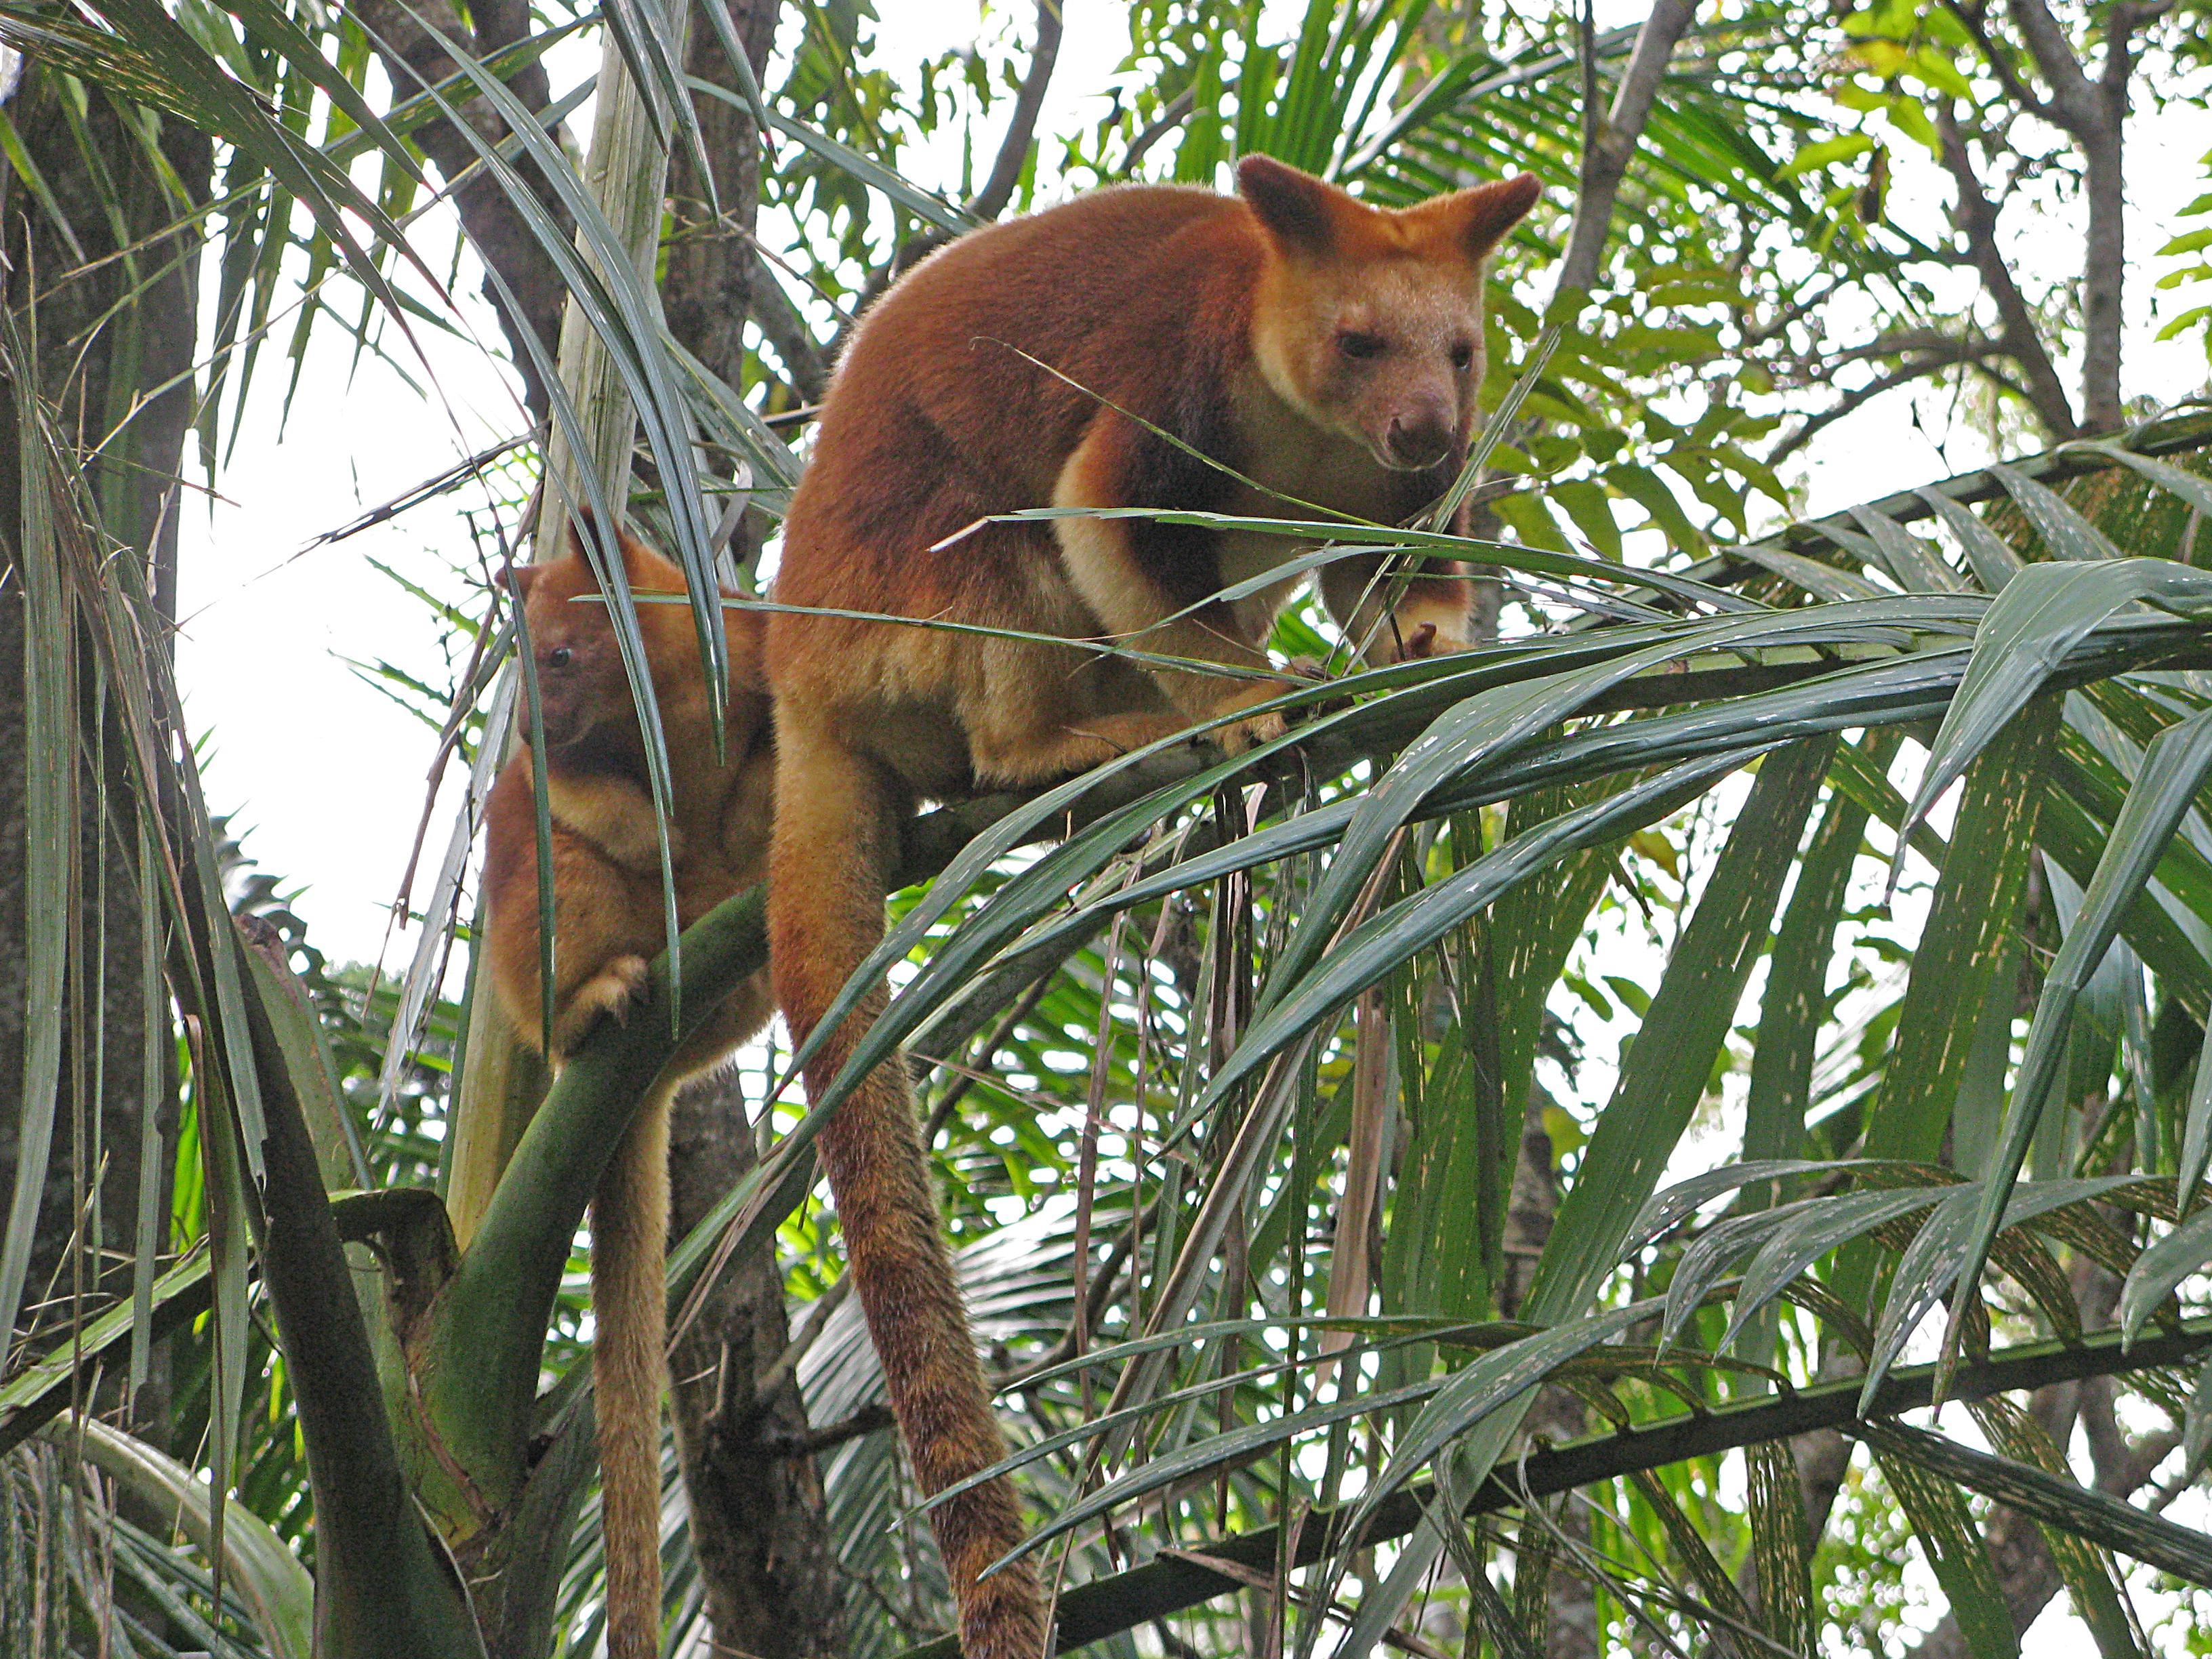 tree kangaroos Nightline travels to papua new guinea to see tree kangaroos, a rare and  endangered species, roam tree tops.